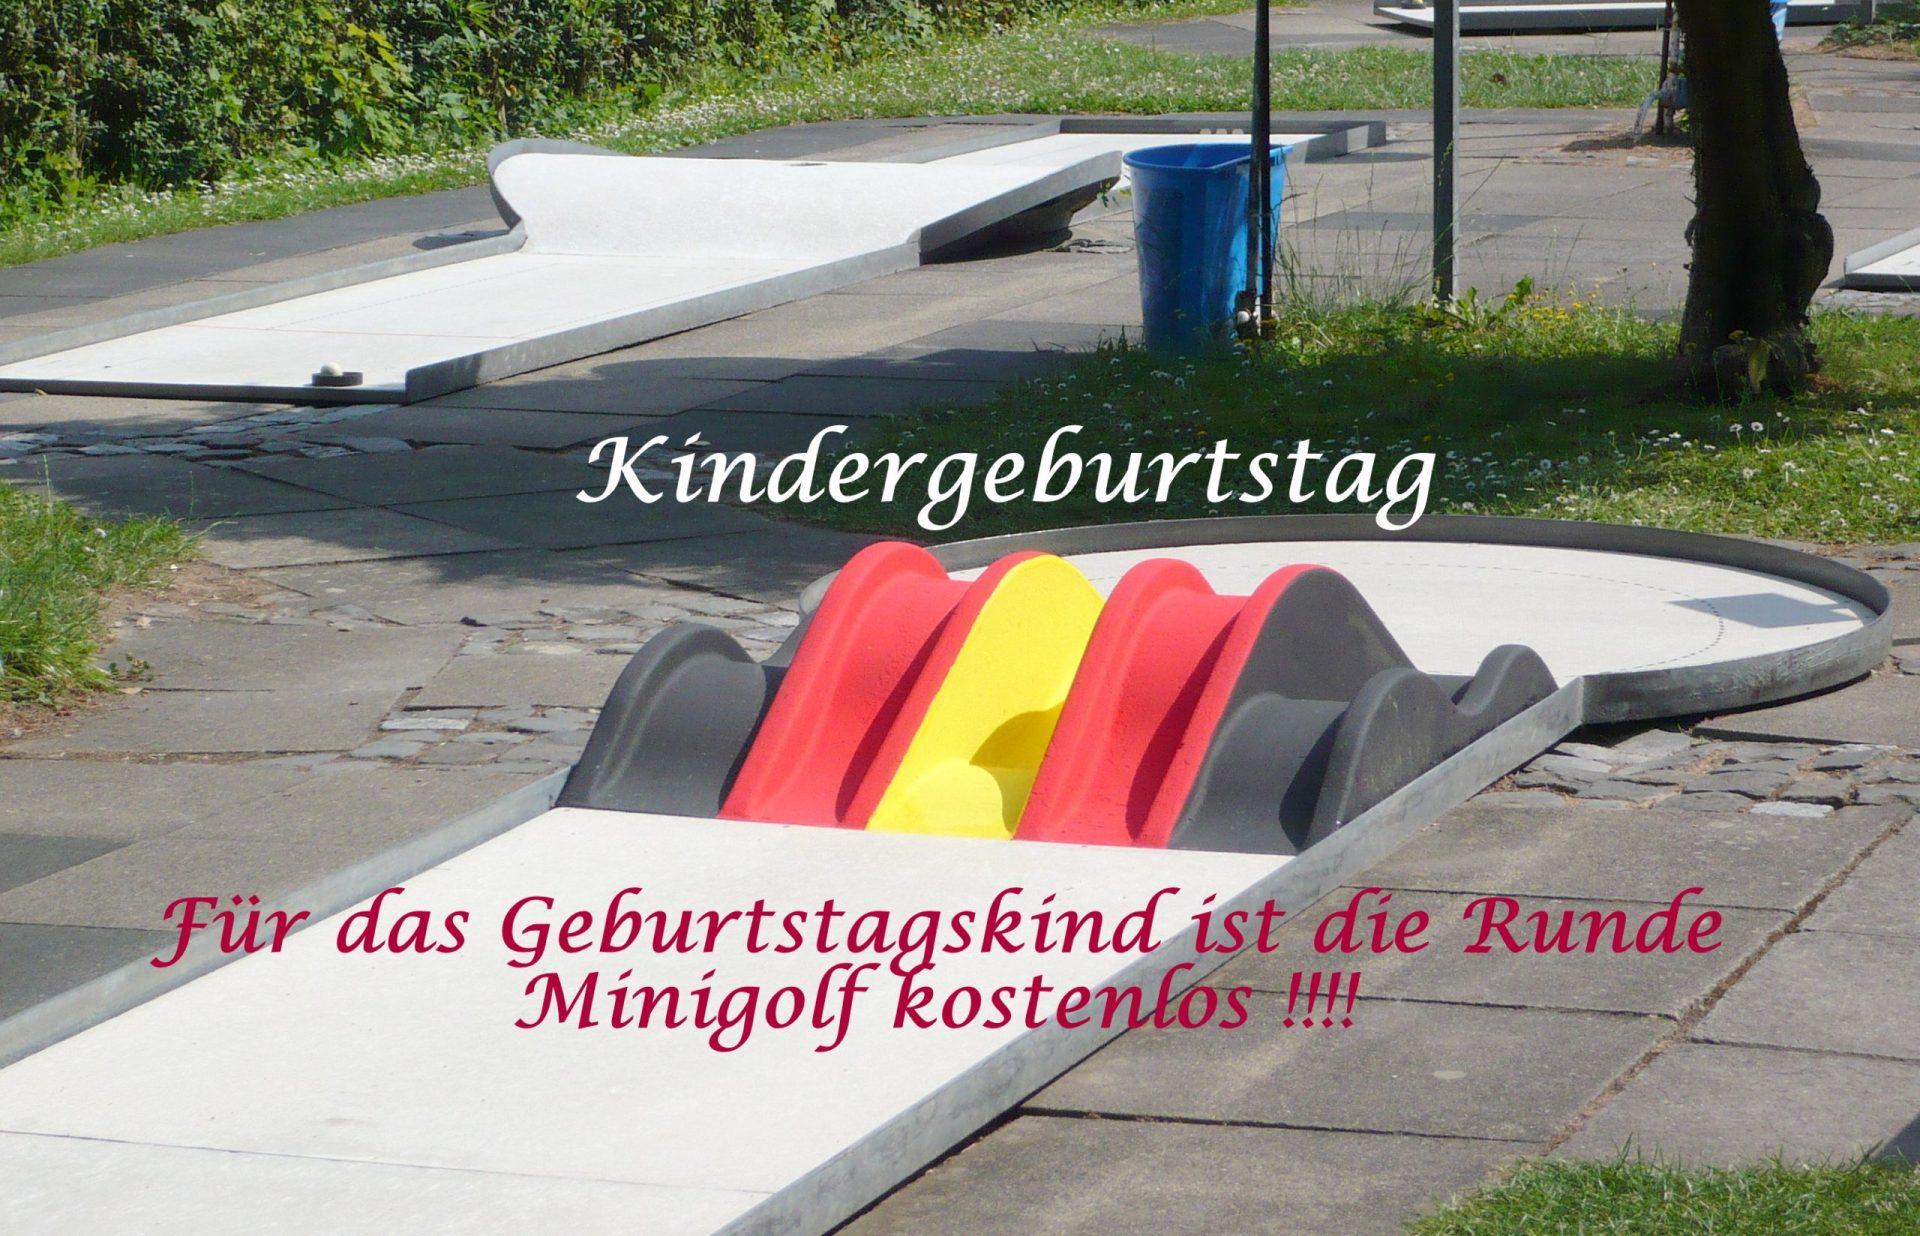 minigolf_Kindergeburtstag-2